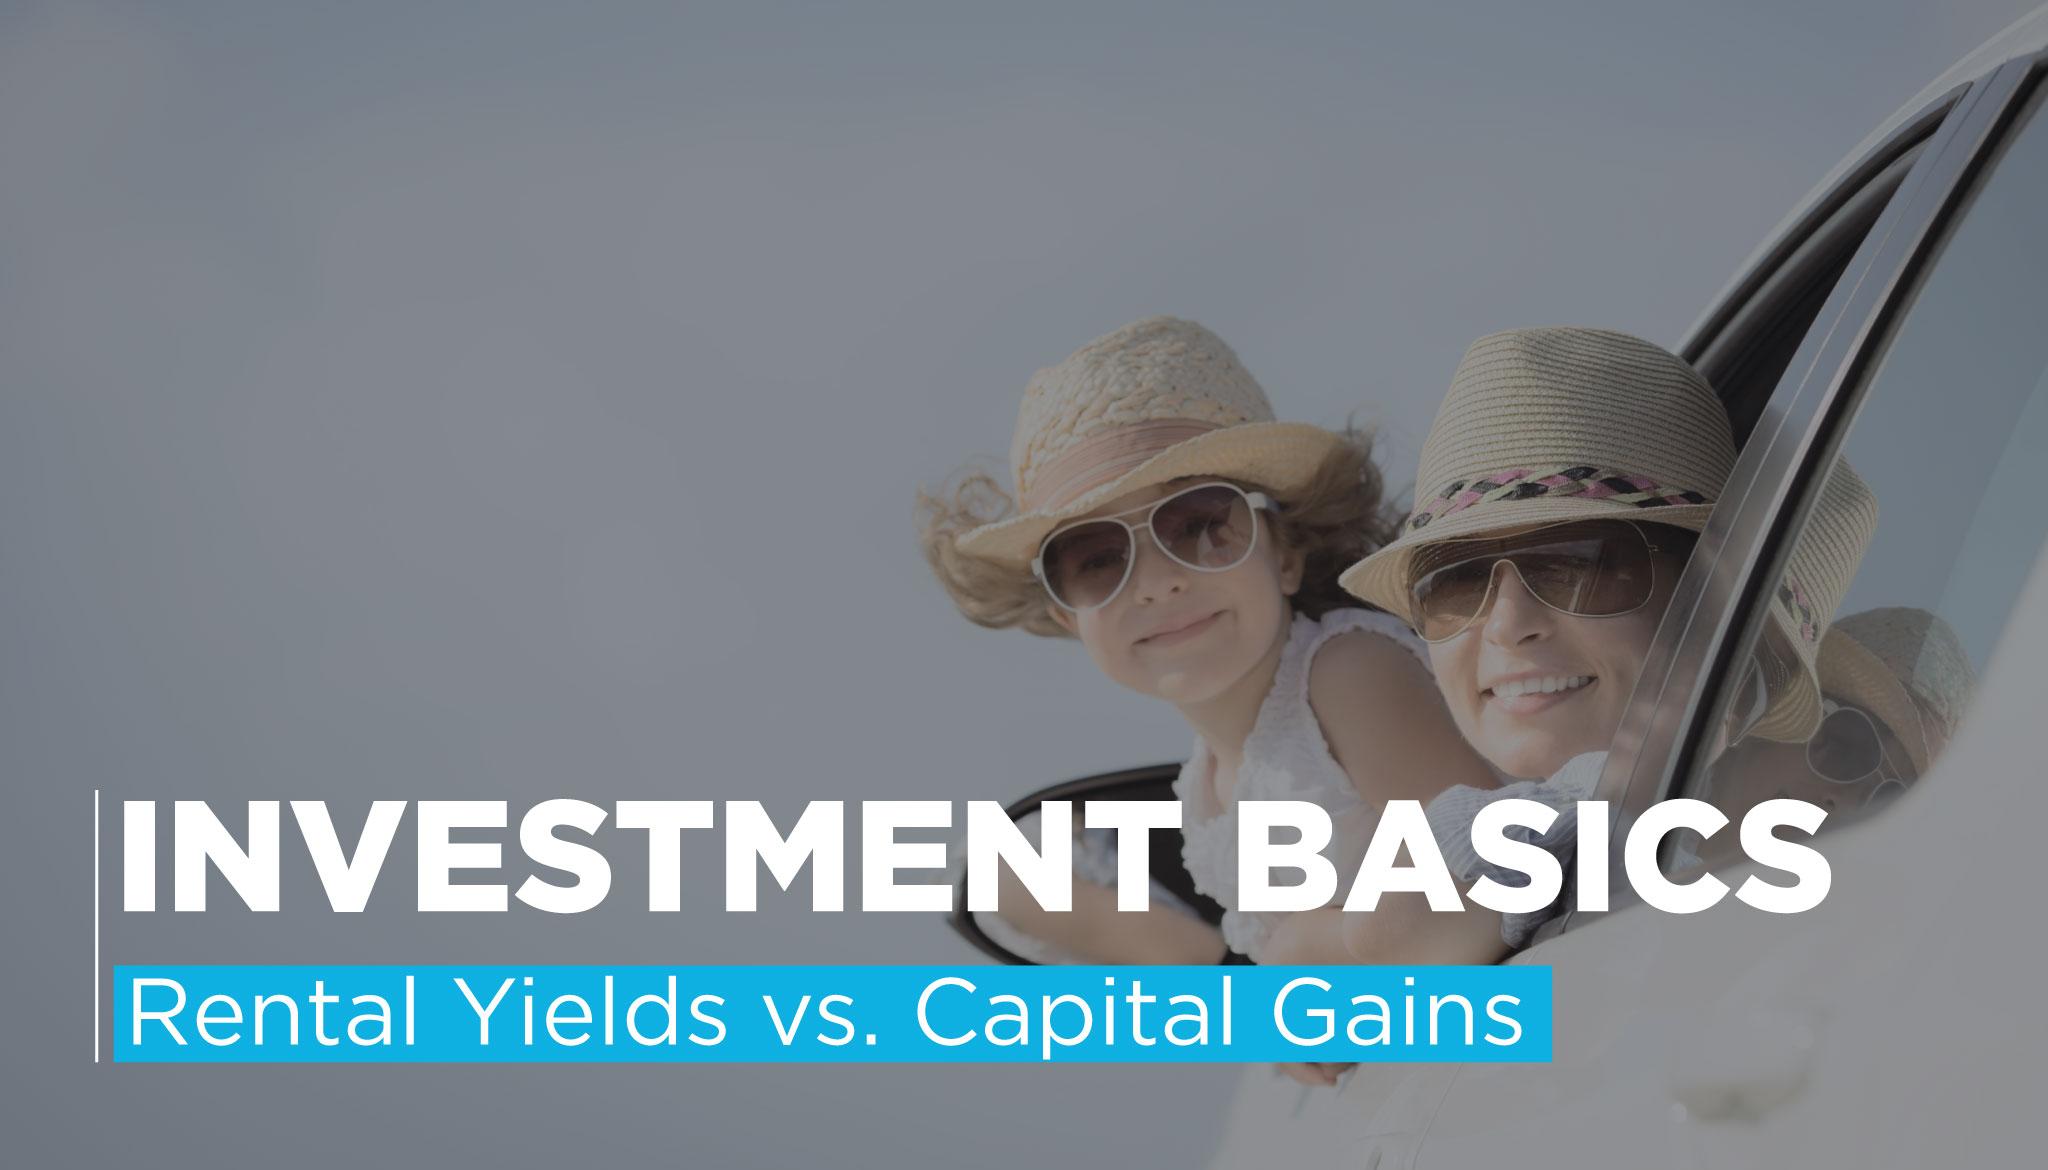 Yield-vs-Capital-Gains.jpg